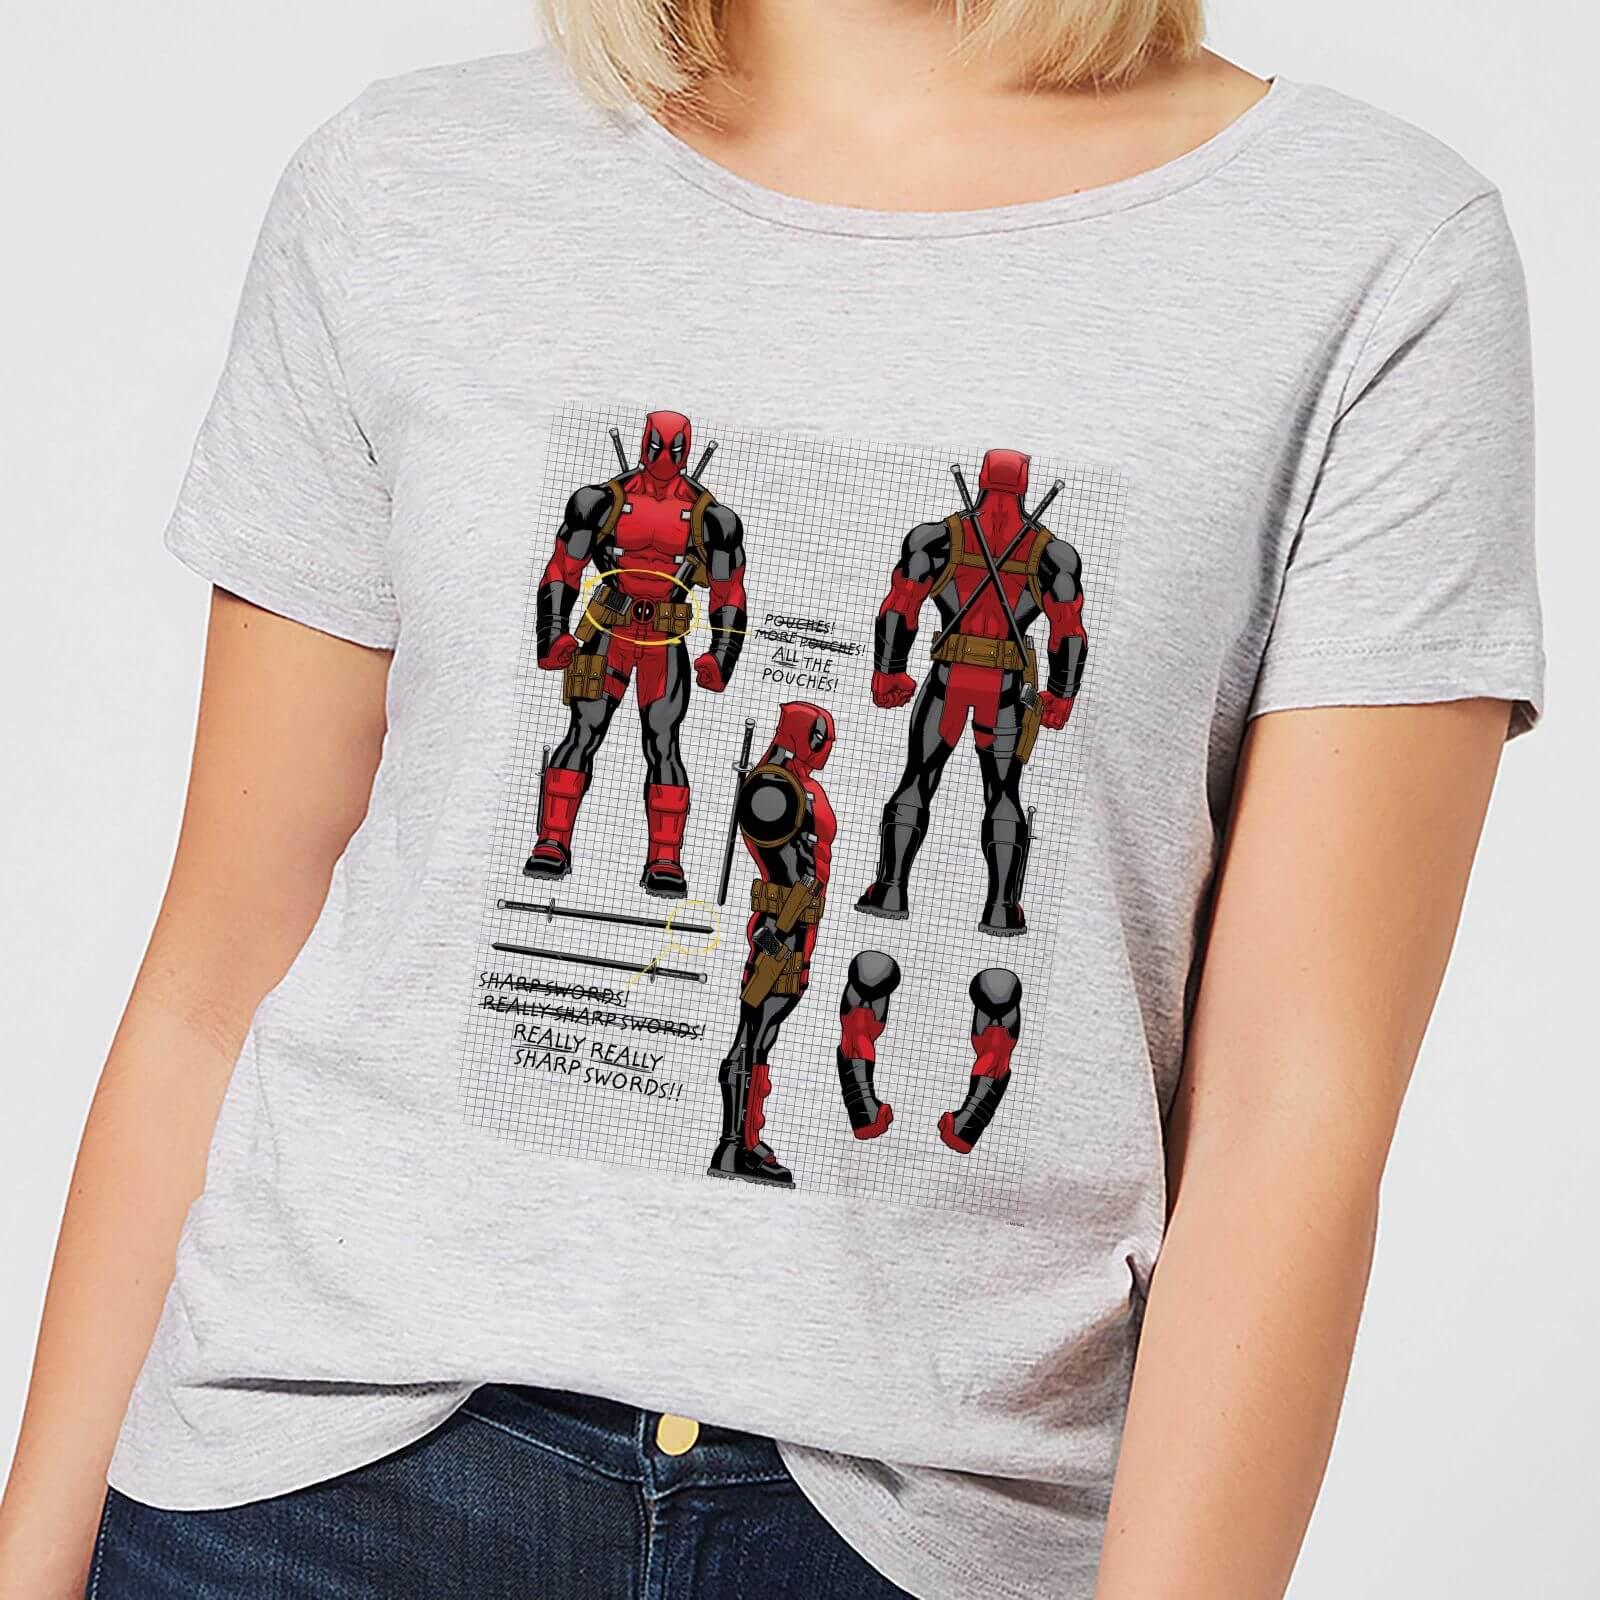 OfferteWeb.click 53-t-shirt-marvel-deadpool-action-figure-plans-grigio-donna